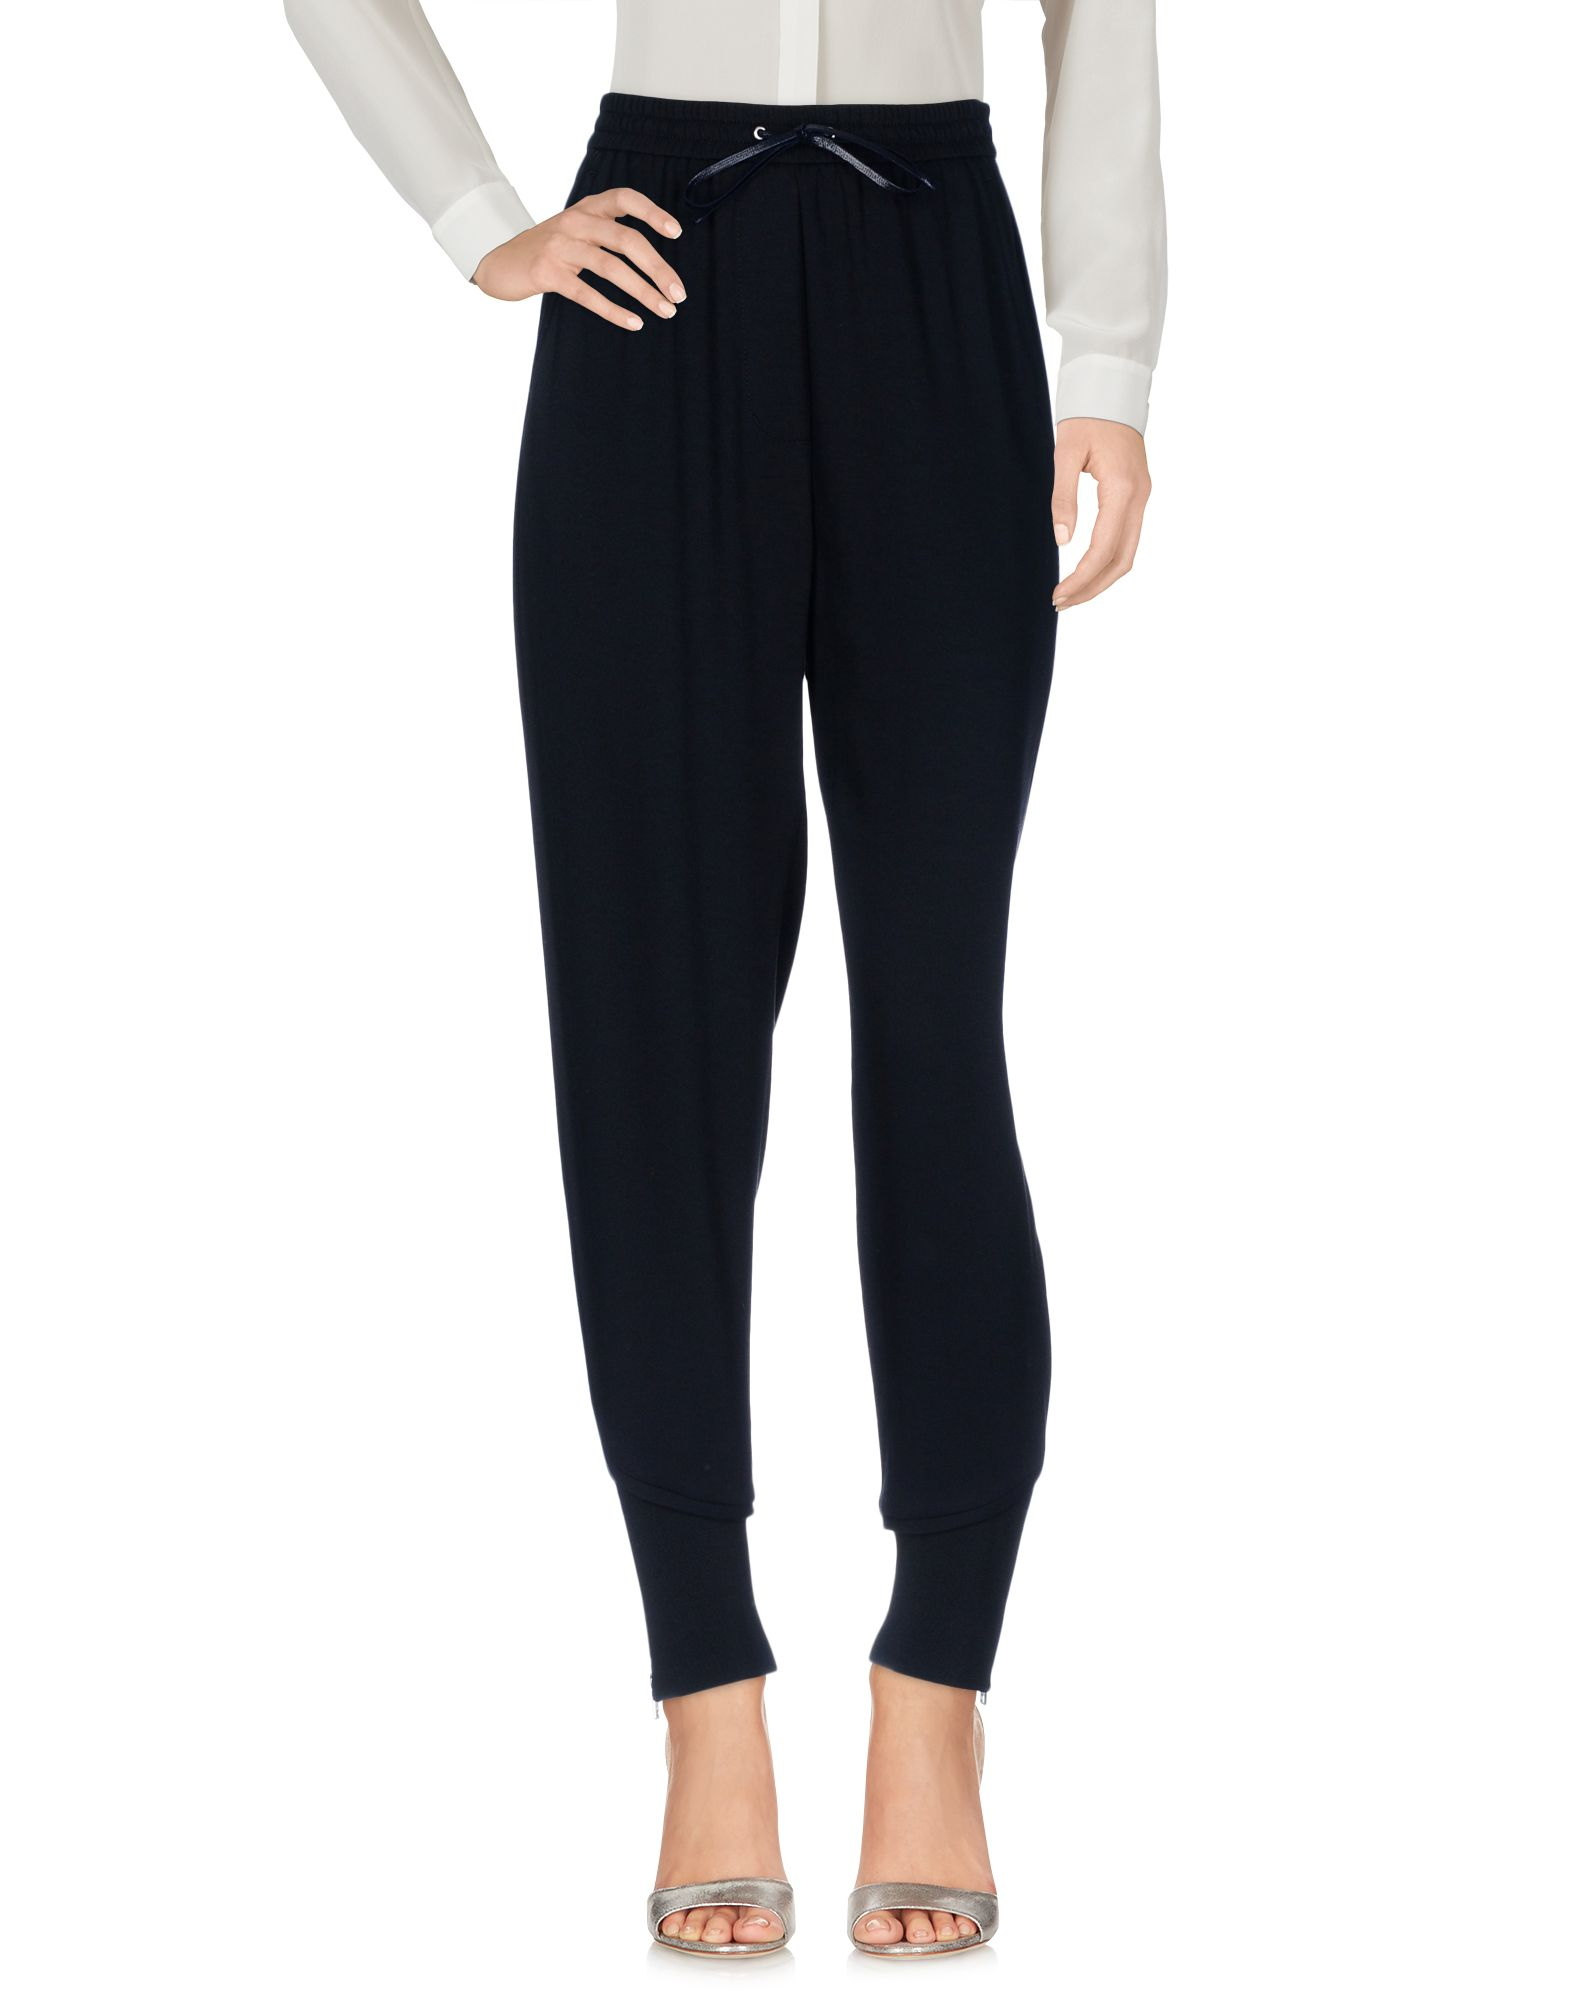 Pantalone 3.1 Phillip Lim donna donna - 13114723EU